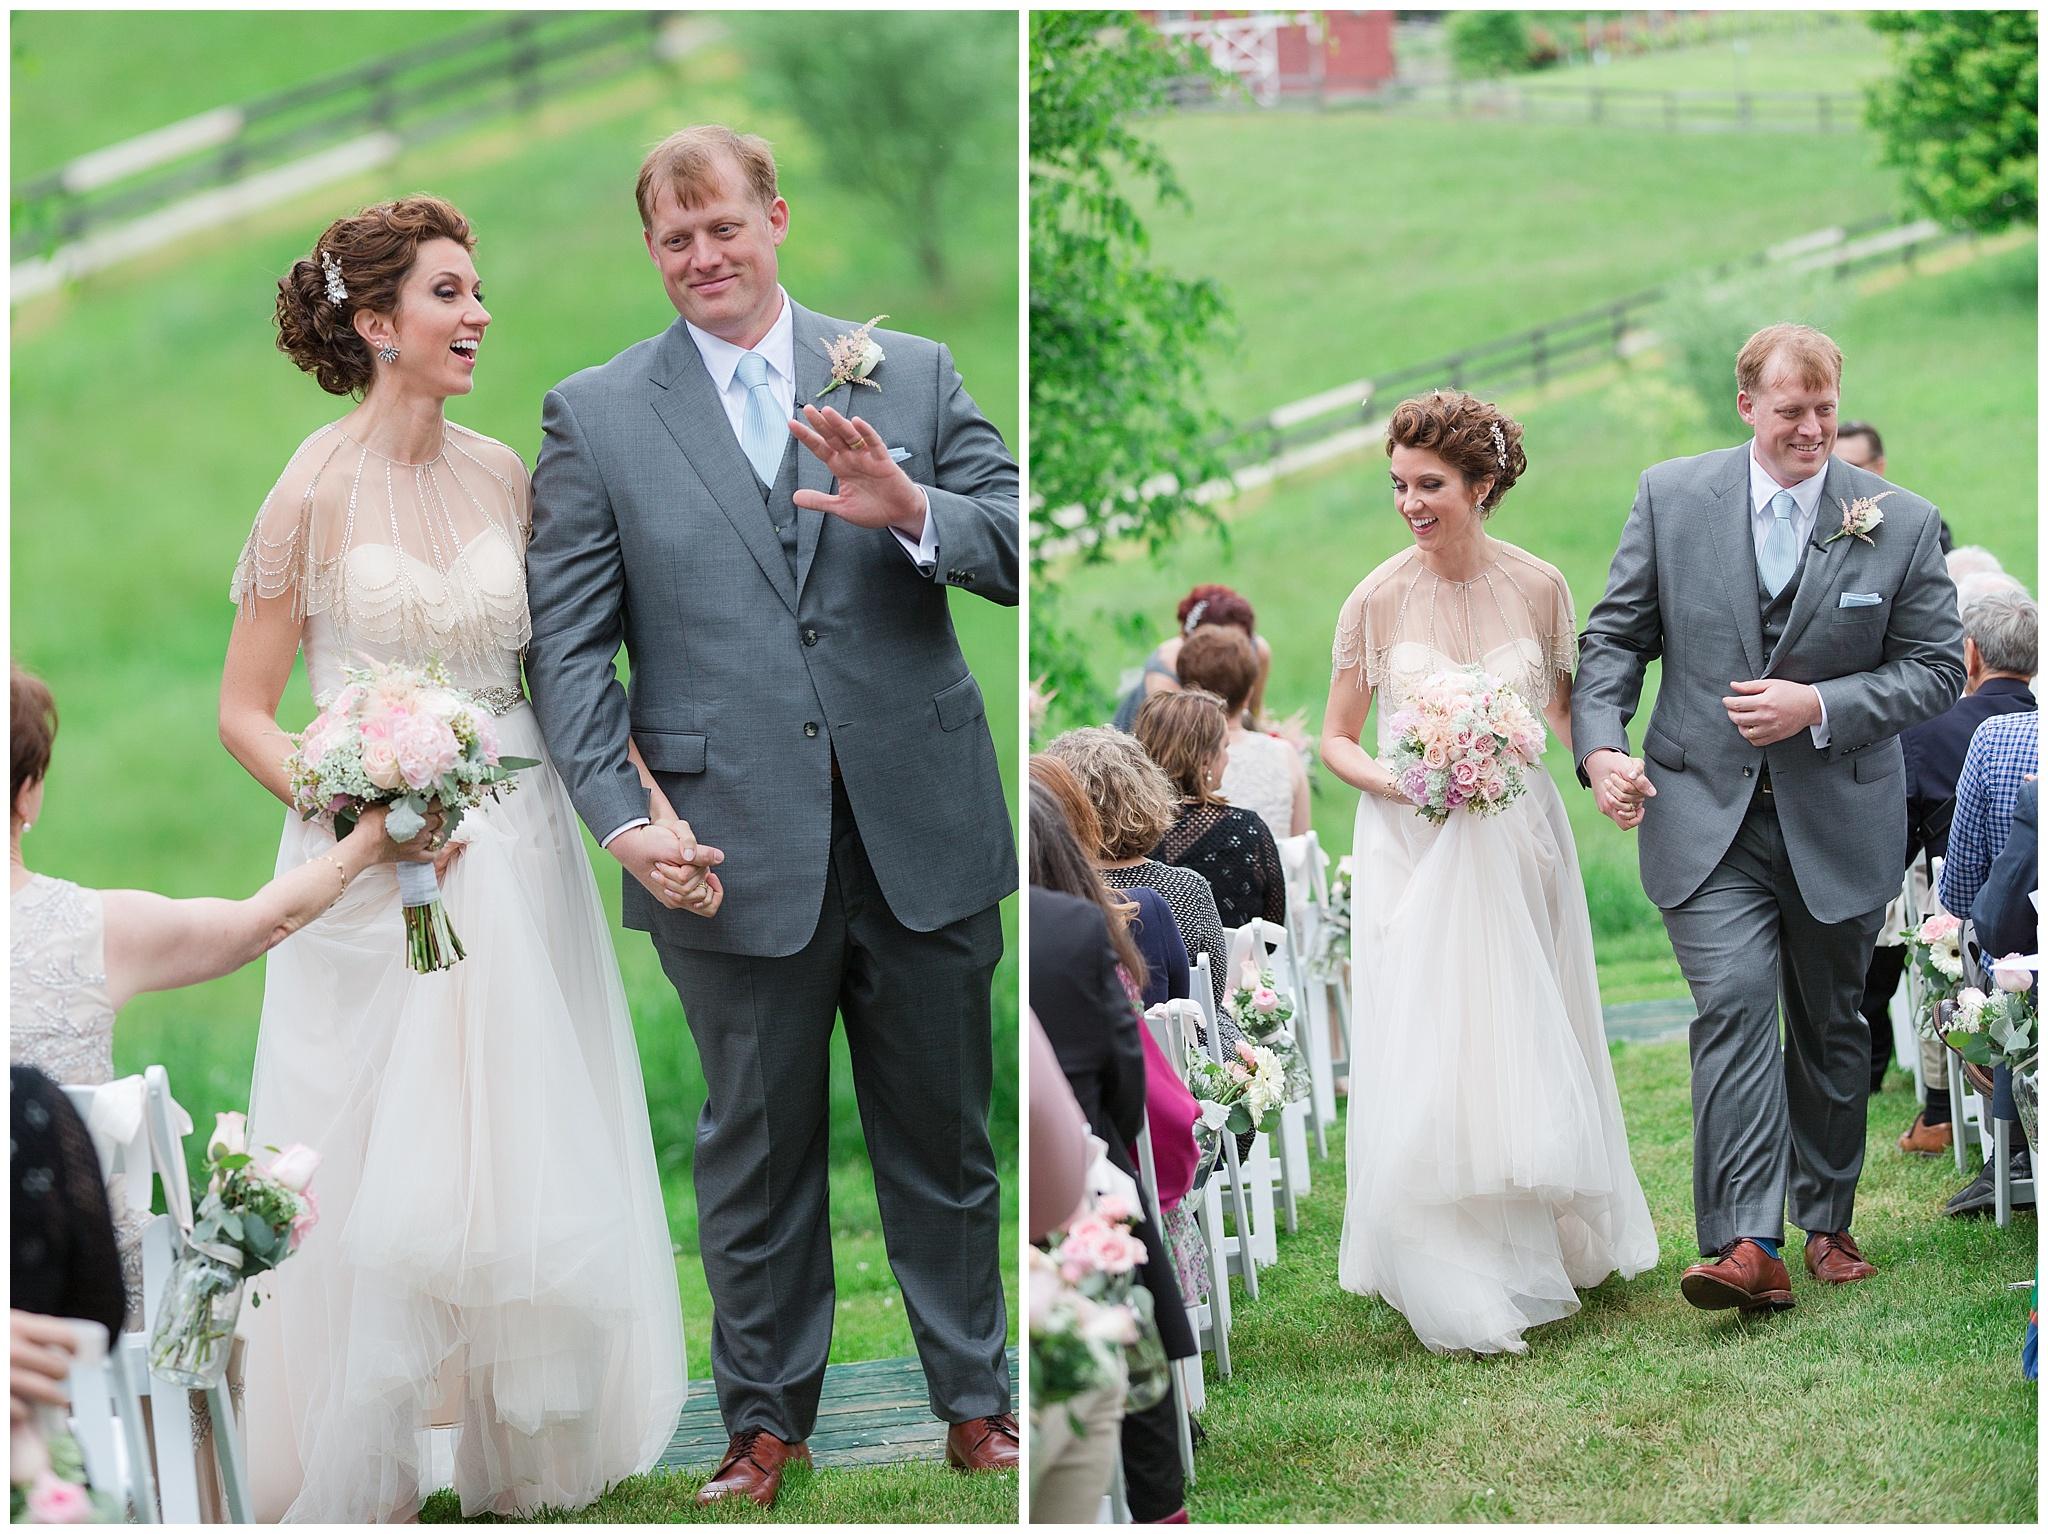 Wedding_Courtney_David_0063.jpg